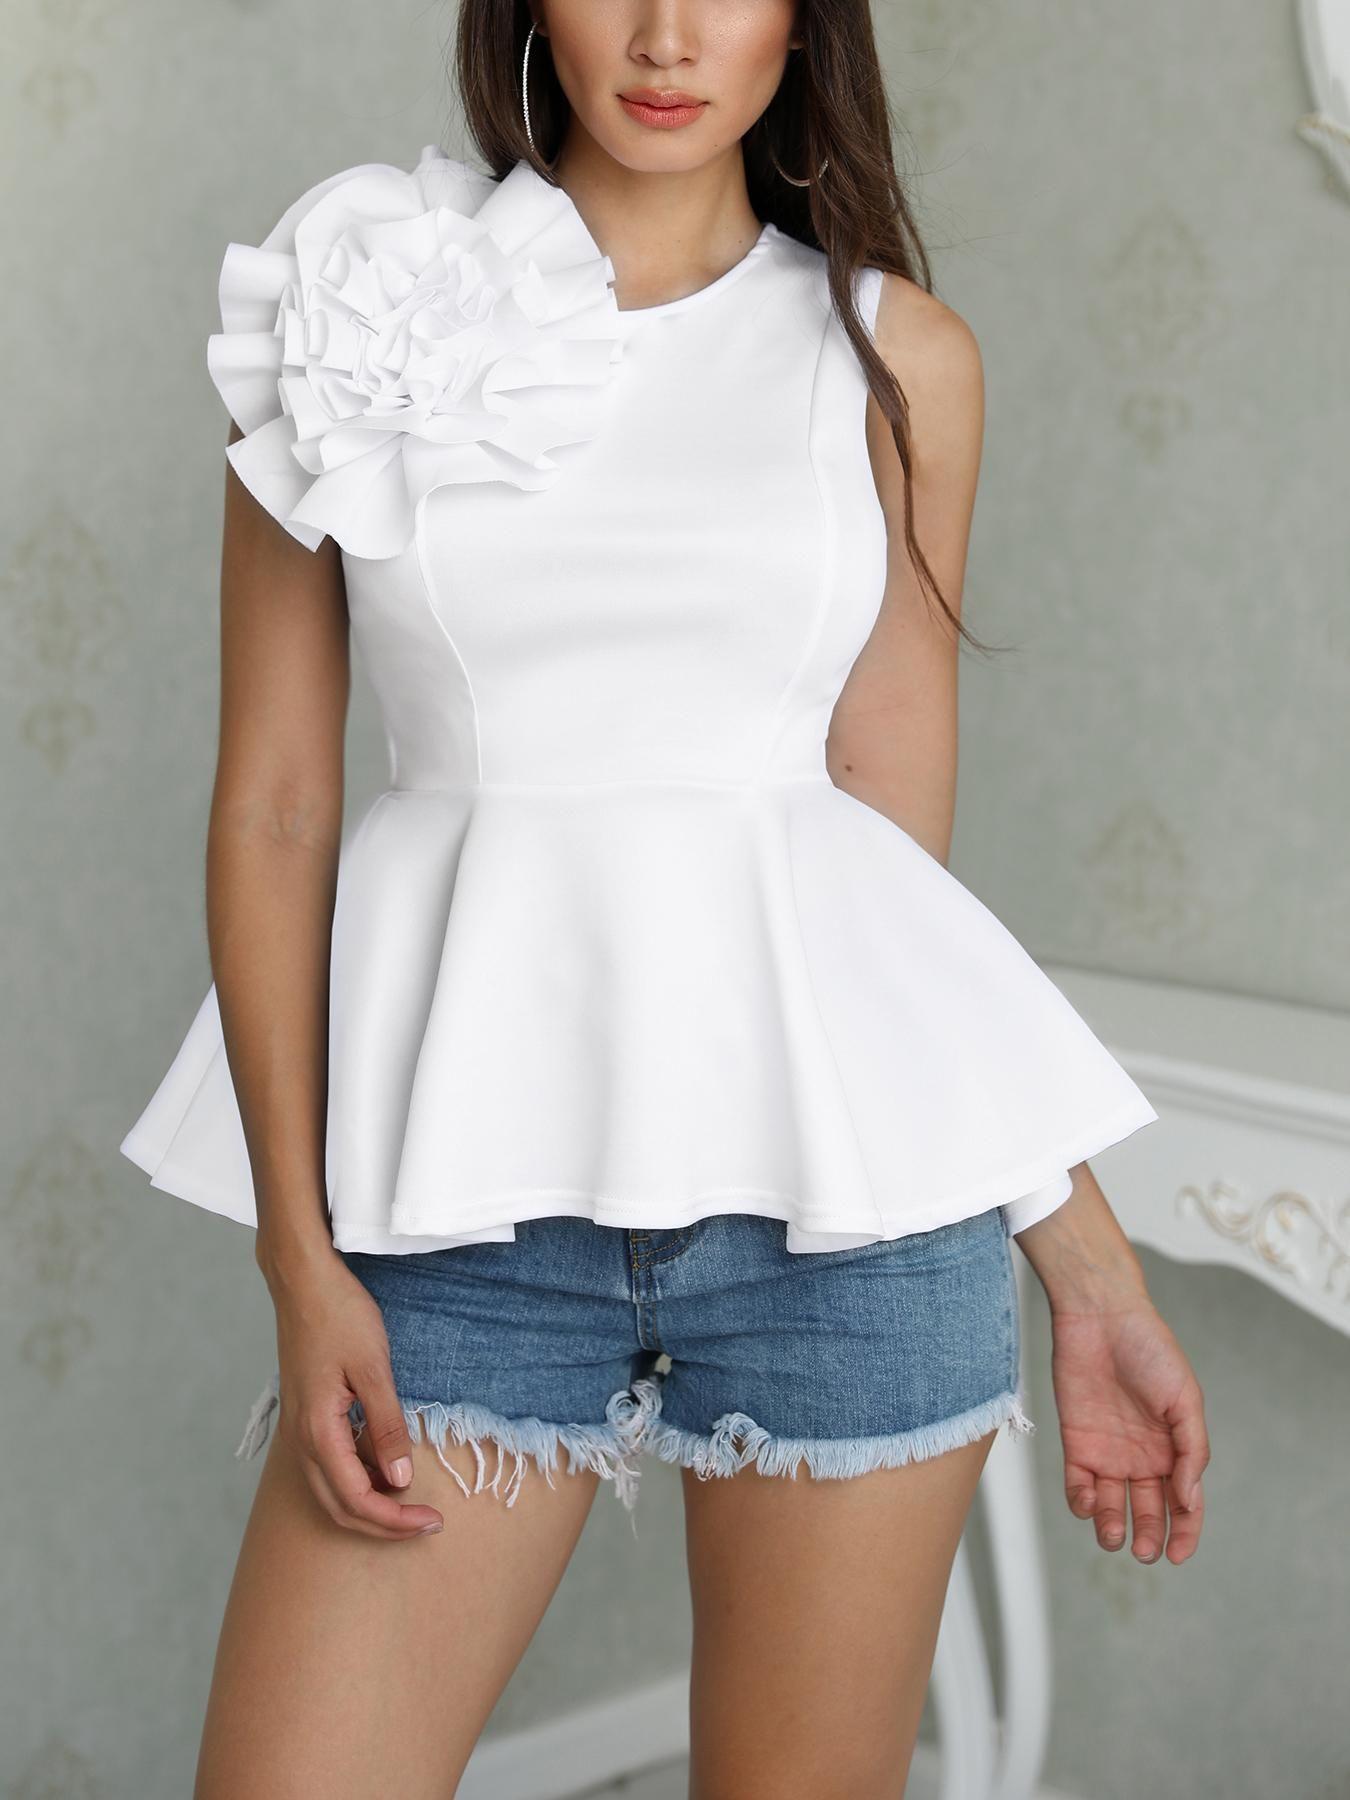 Flower Applique Zipper Back Peplum Top | Fashion, Blouses for ...